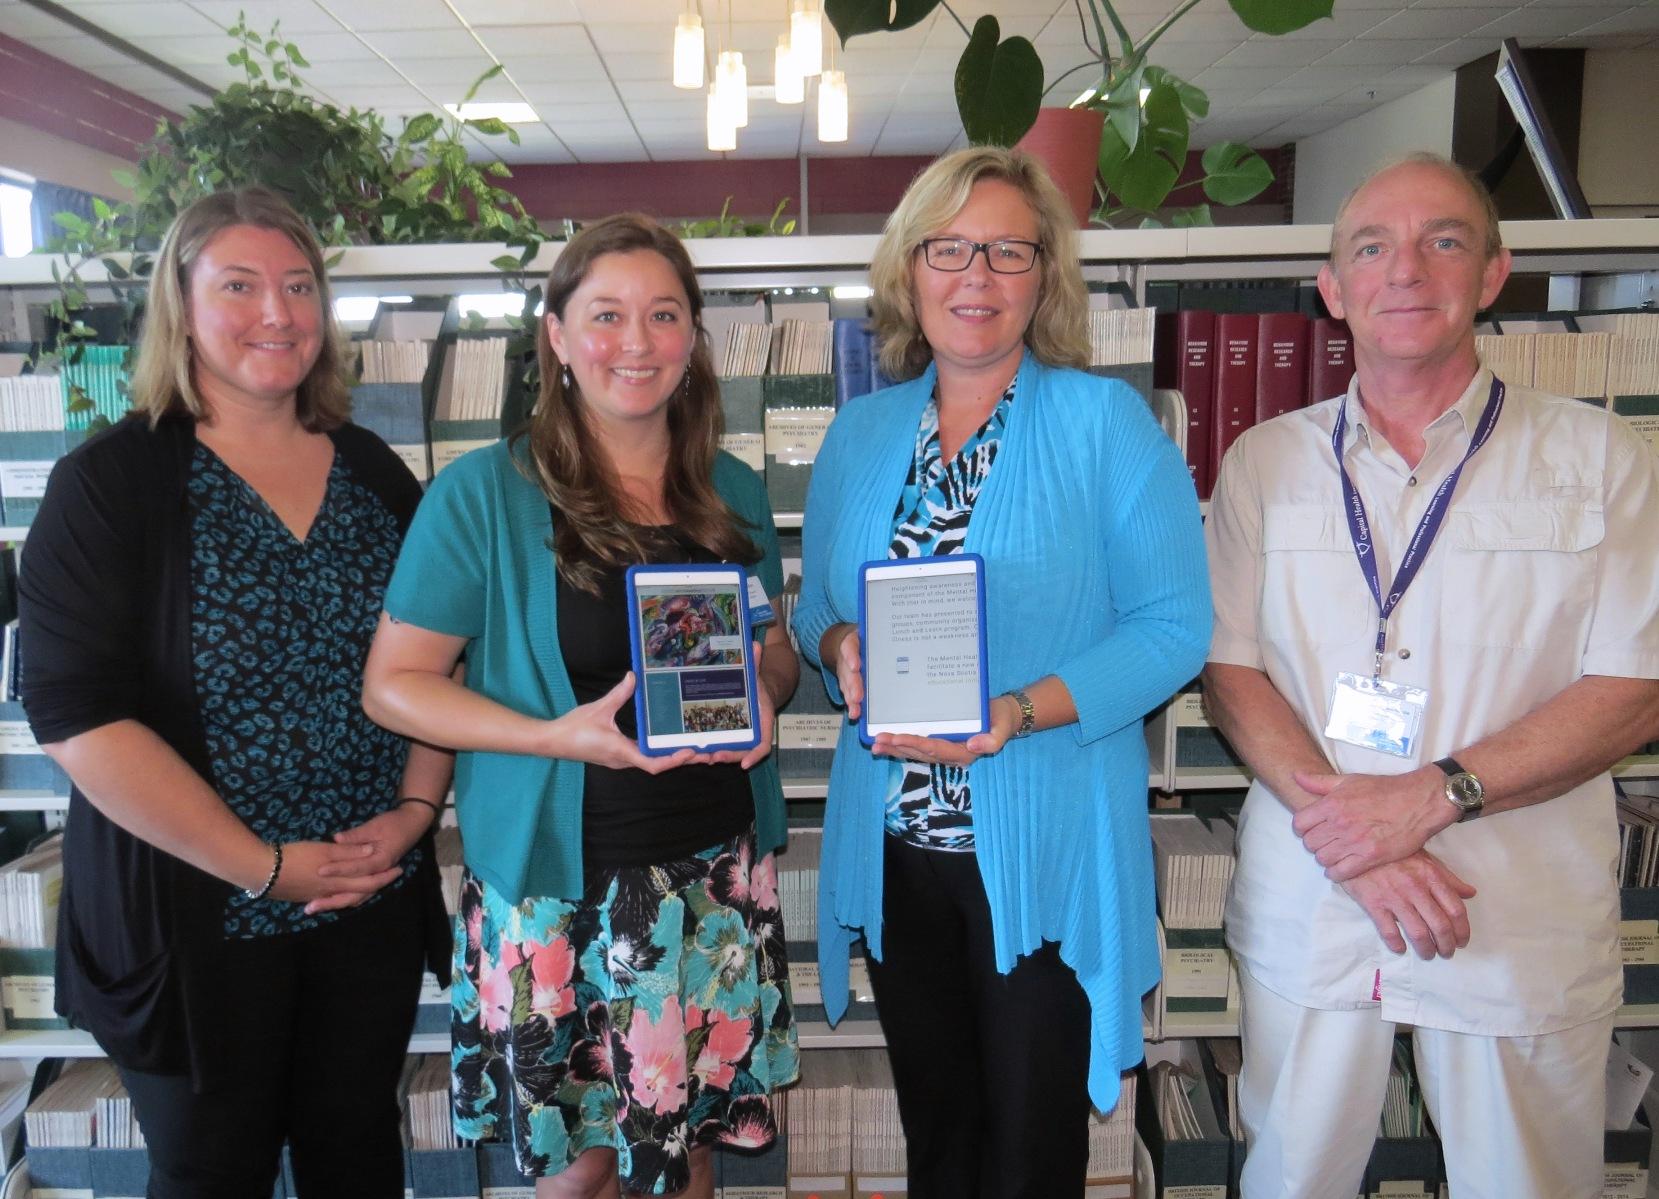 Jackie Zoppa (Library Technician), Lara Killian (Librarian Educator), Starr Dobson (President & CEO, Mental Health Foundation of Nova Scotia), Rob MacKenzie (Library Technician)